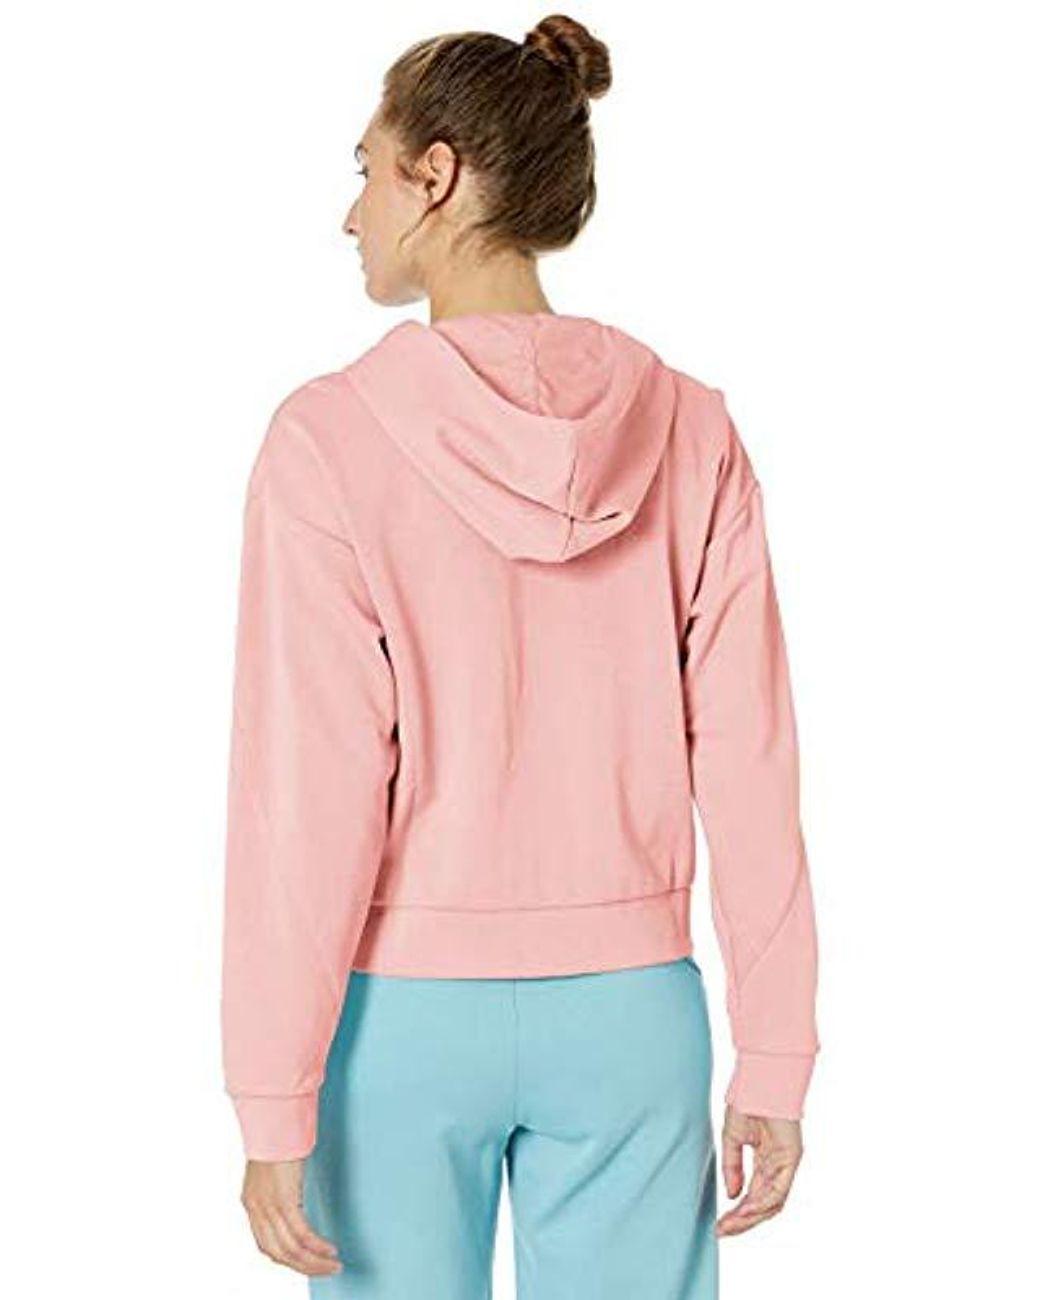 PUMA Modern Sport Crew Damen Sweatshirt bridal rose | L